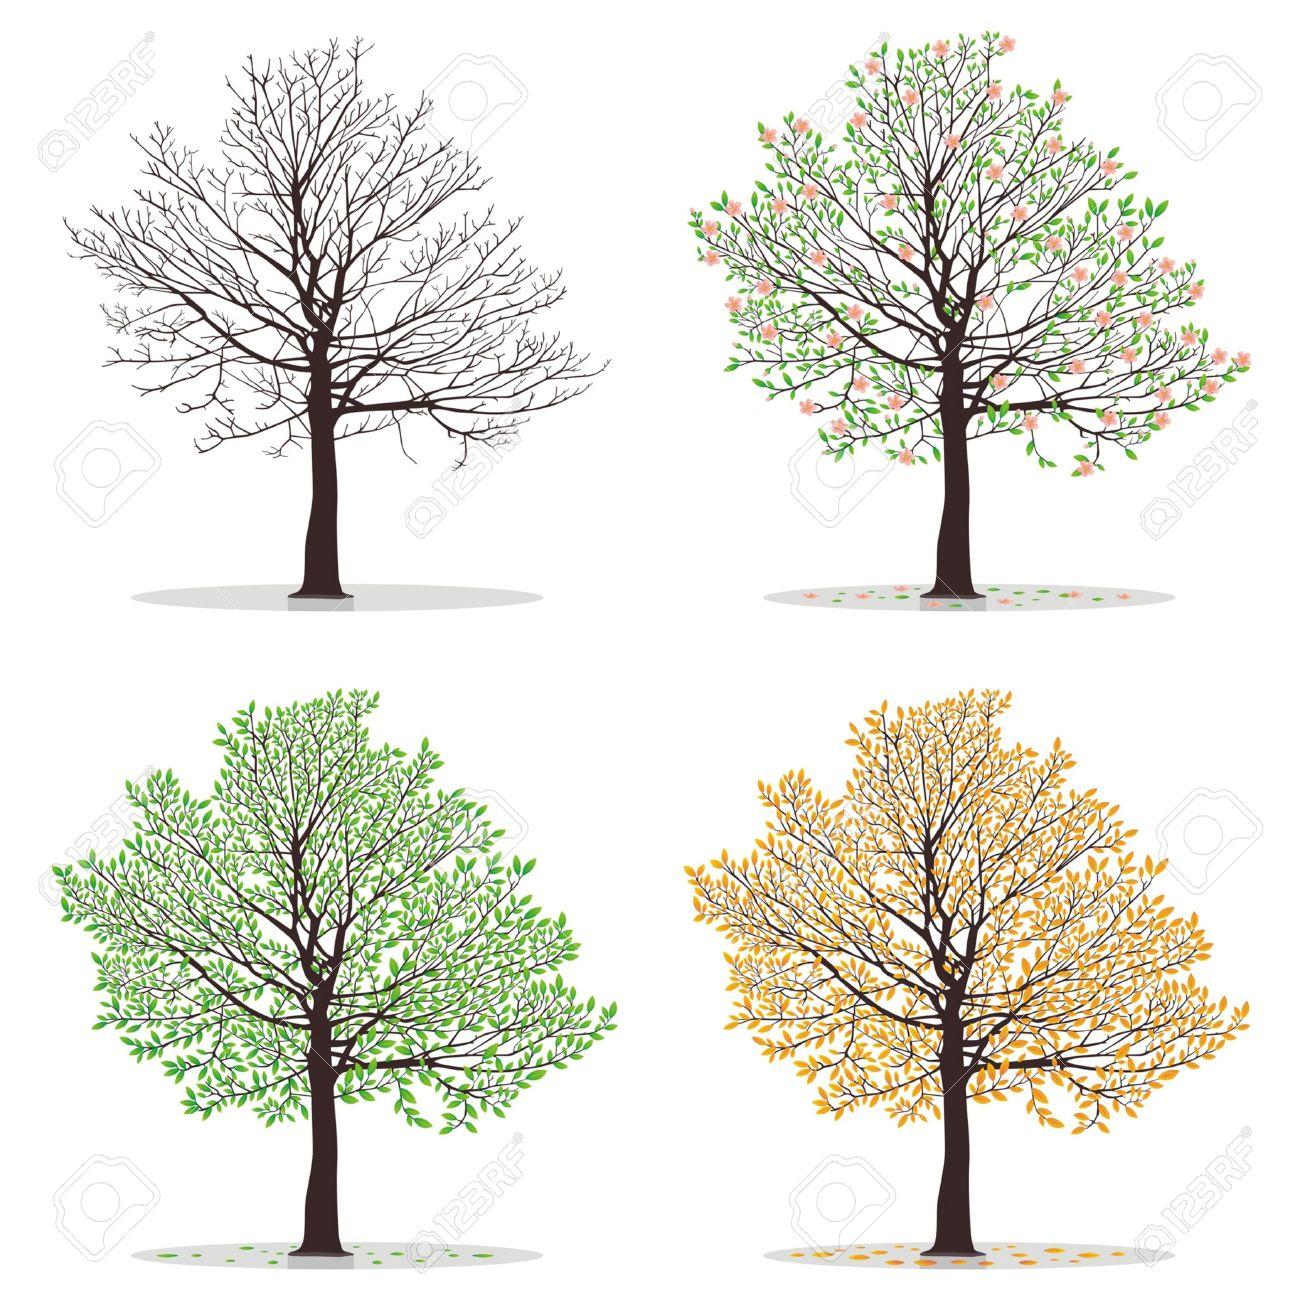 Four seasons - spring, summer, autumn, winter. Art tree beautiful for your design. Vector illustration Stock Vector - 12120732